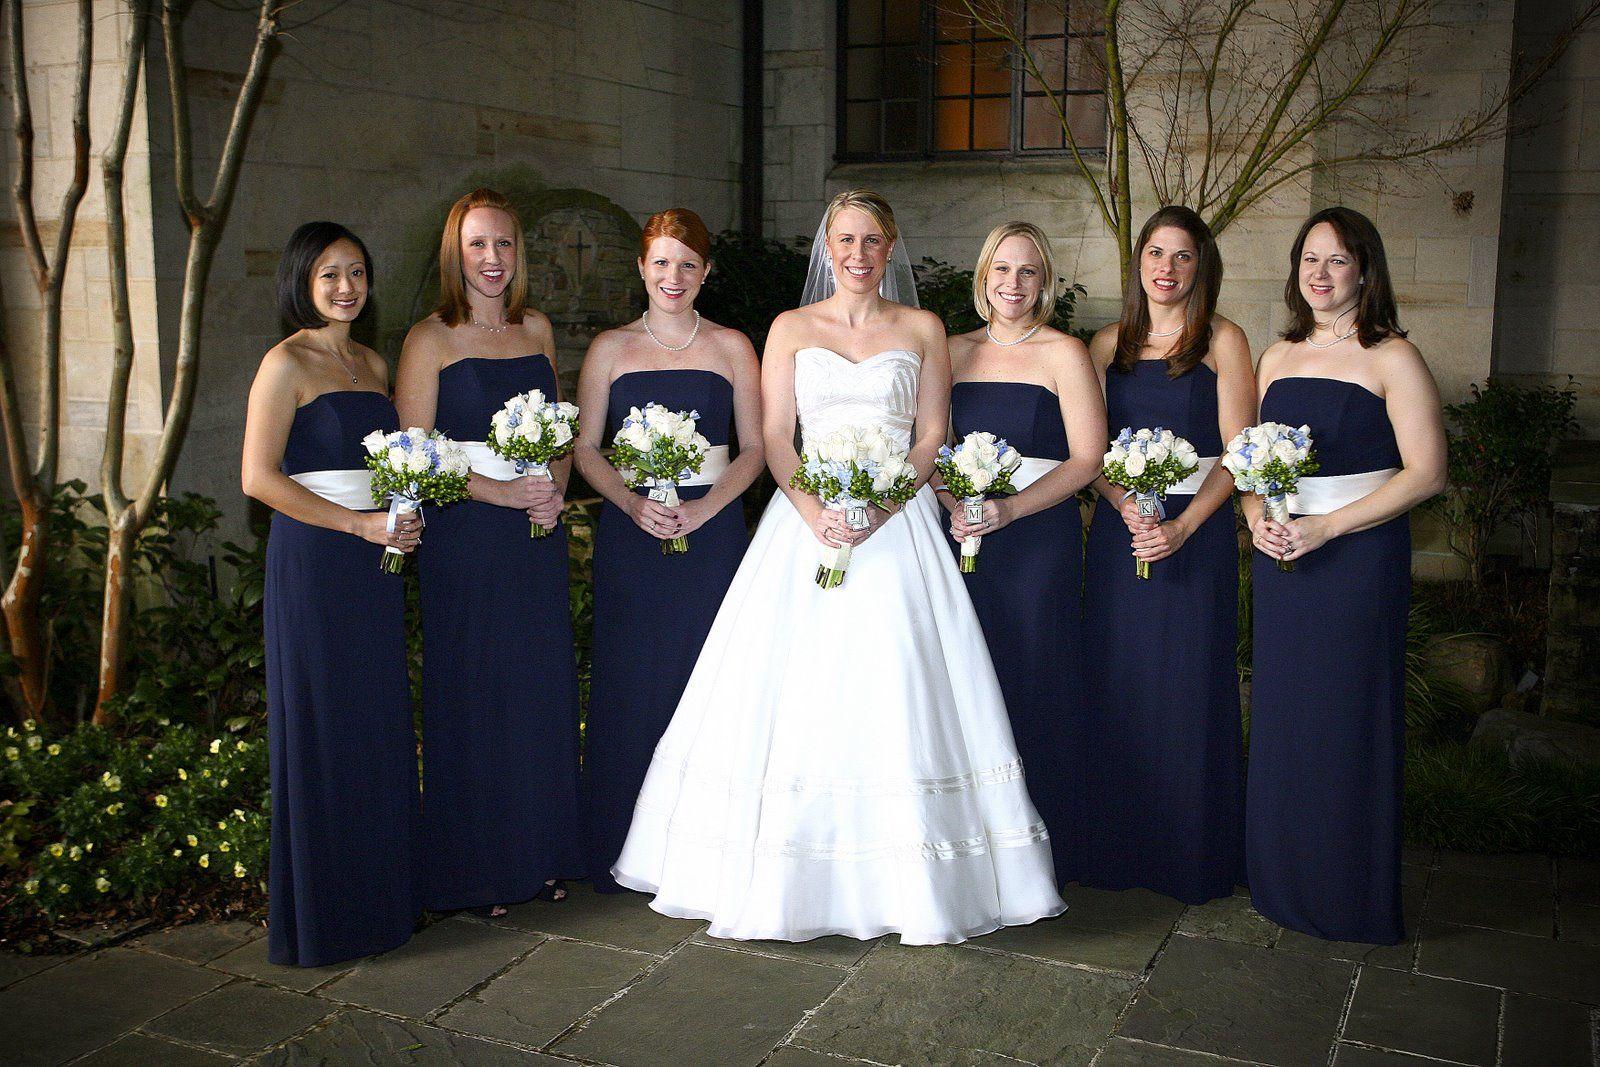 Wedding dresses department stores  Navy and Ivory Bridesmaid Dresses  Nicholeus Wedding  Pinterest